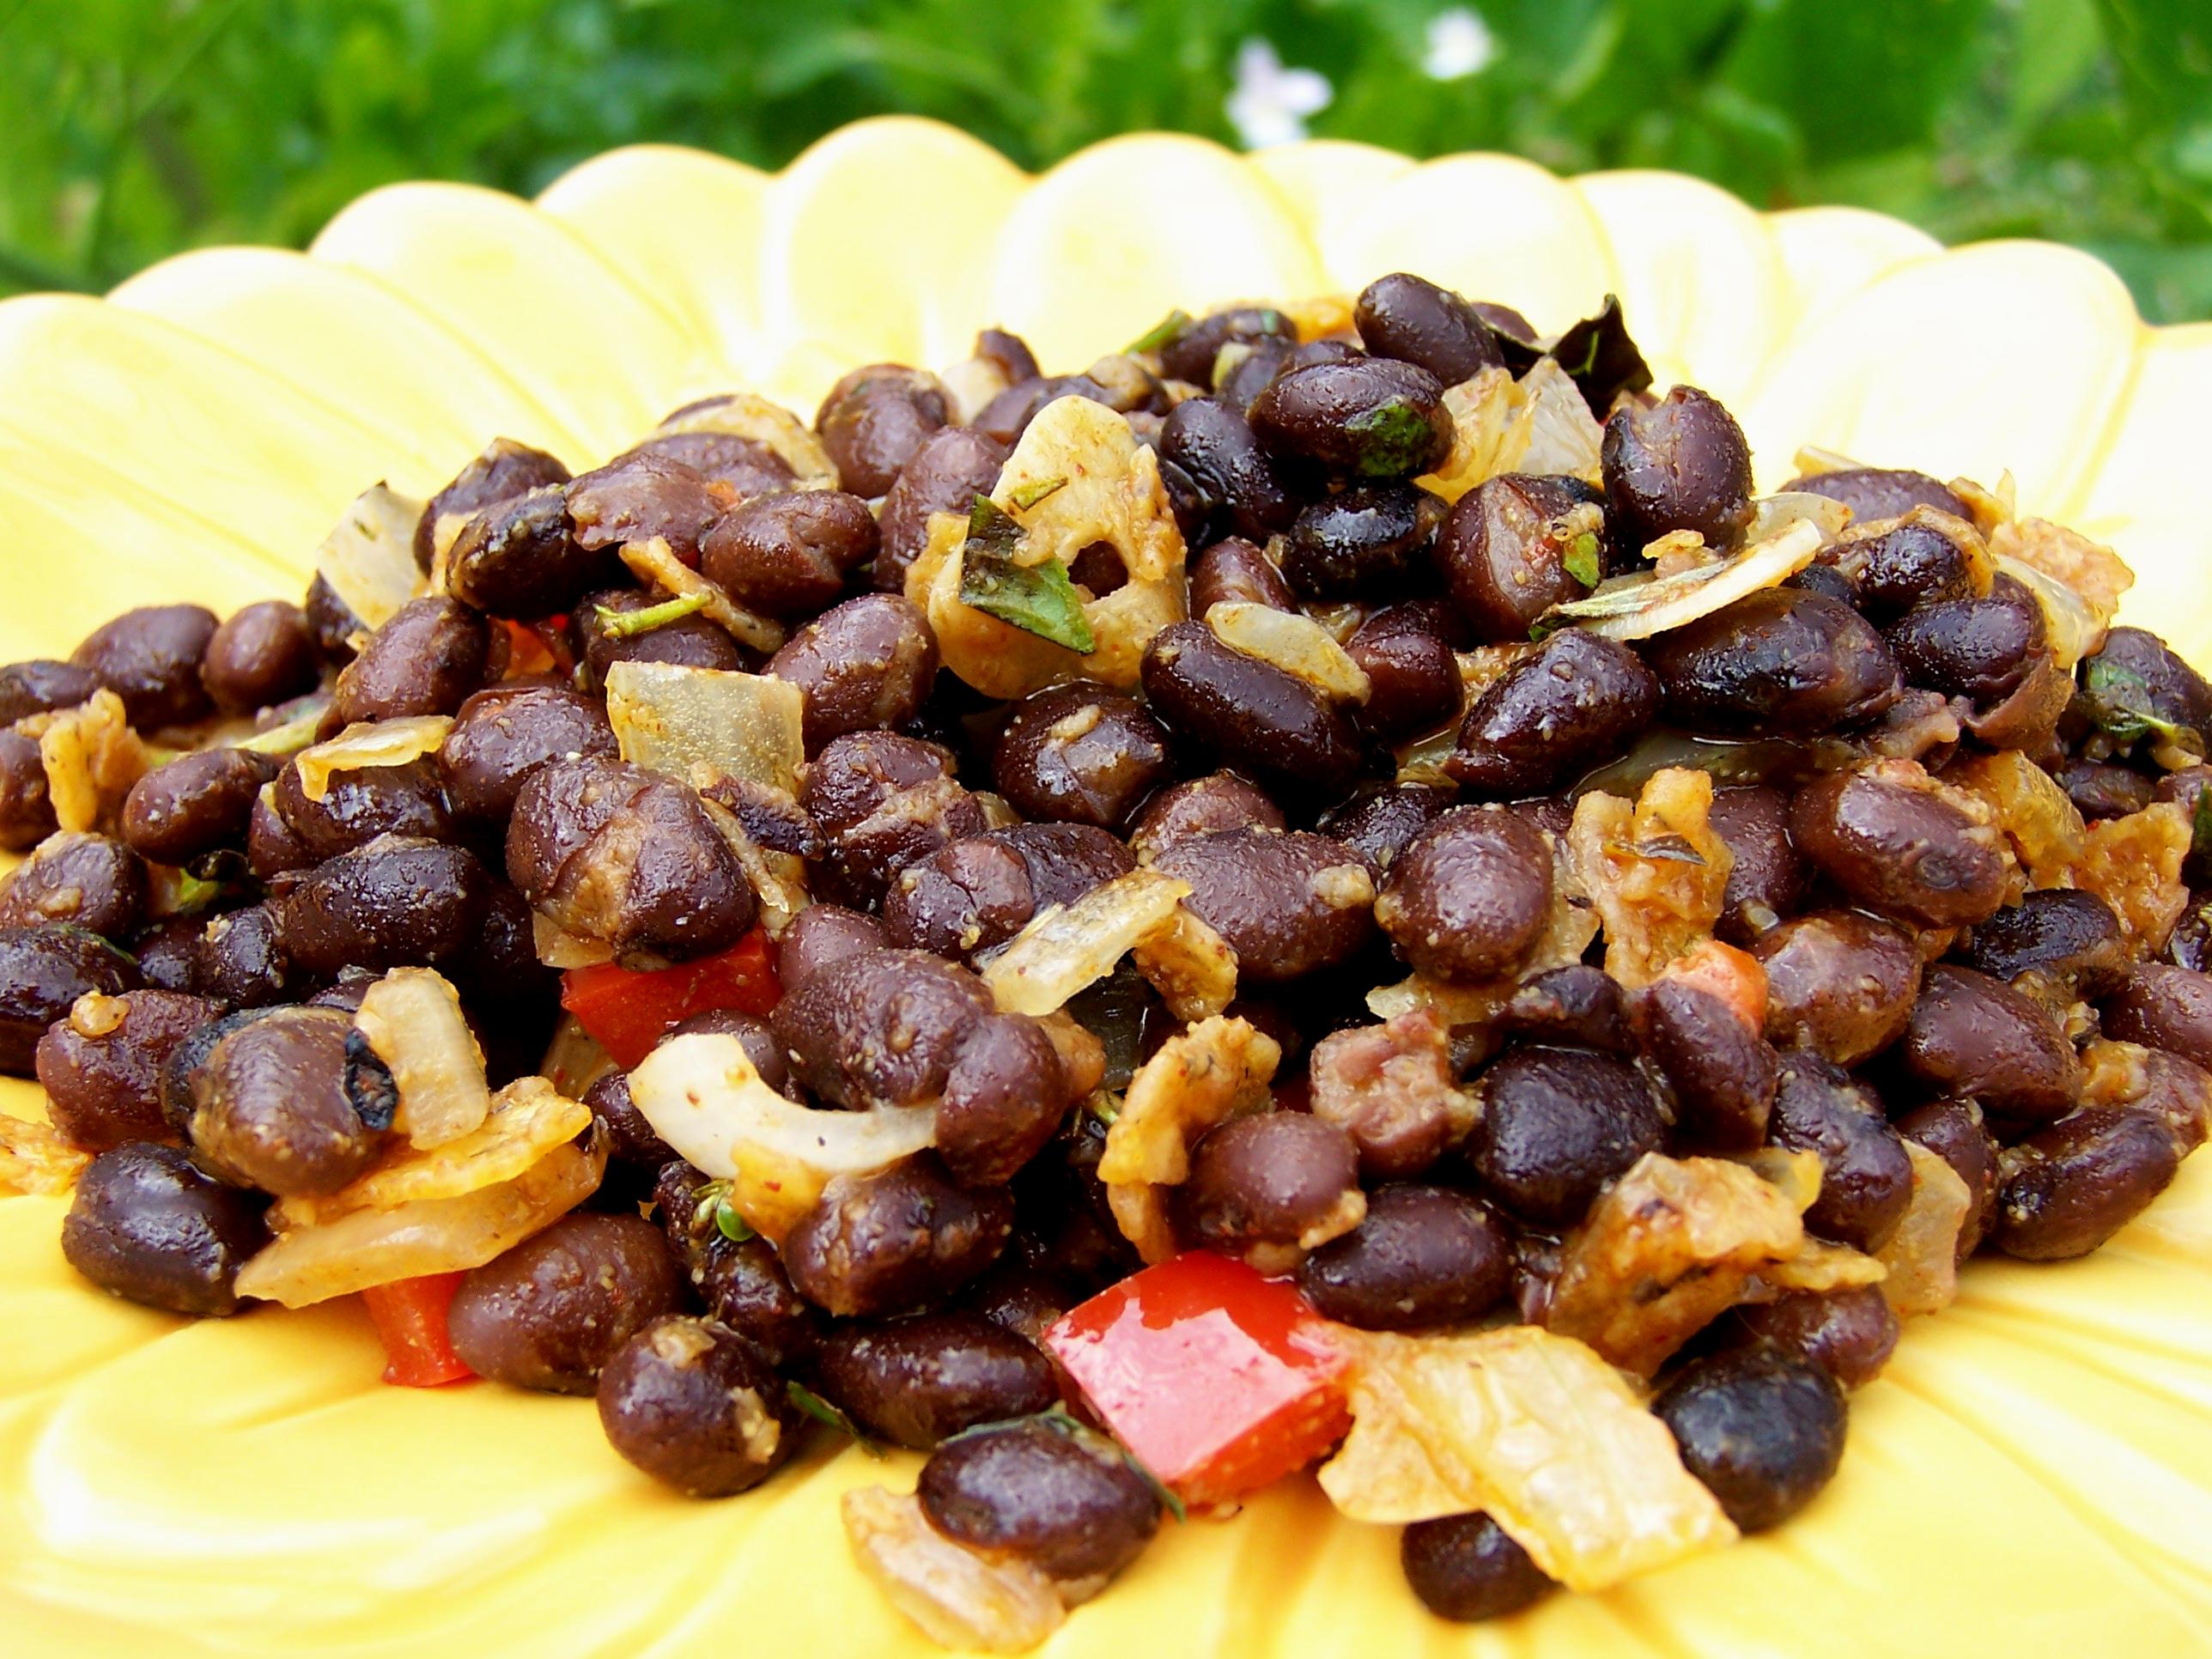 Copycat Chili's Black Beans